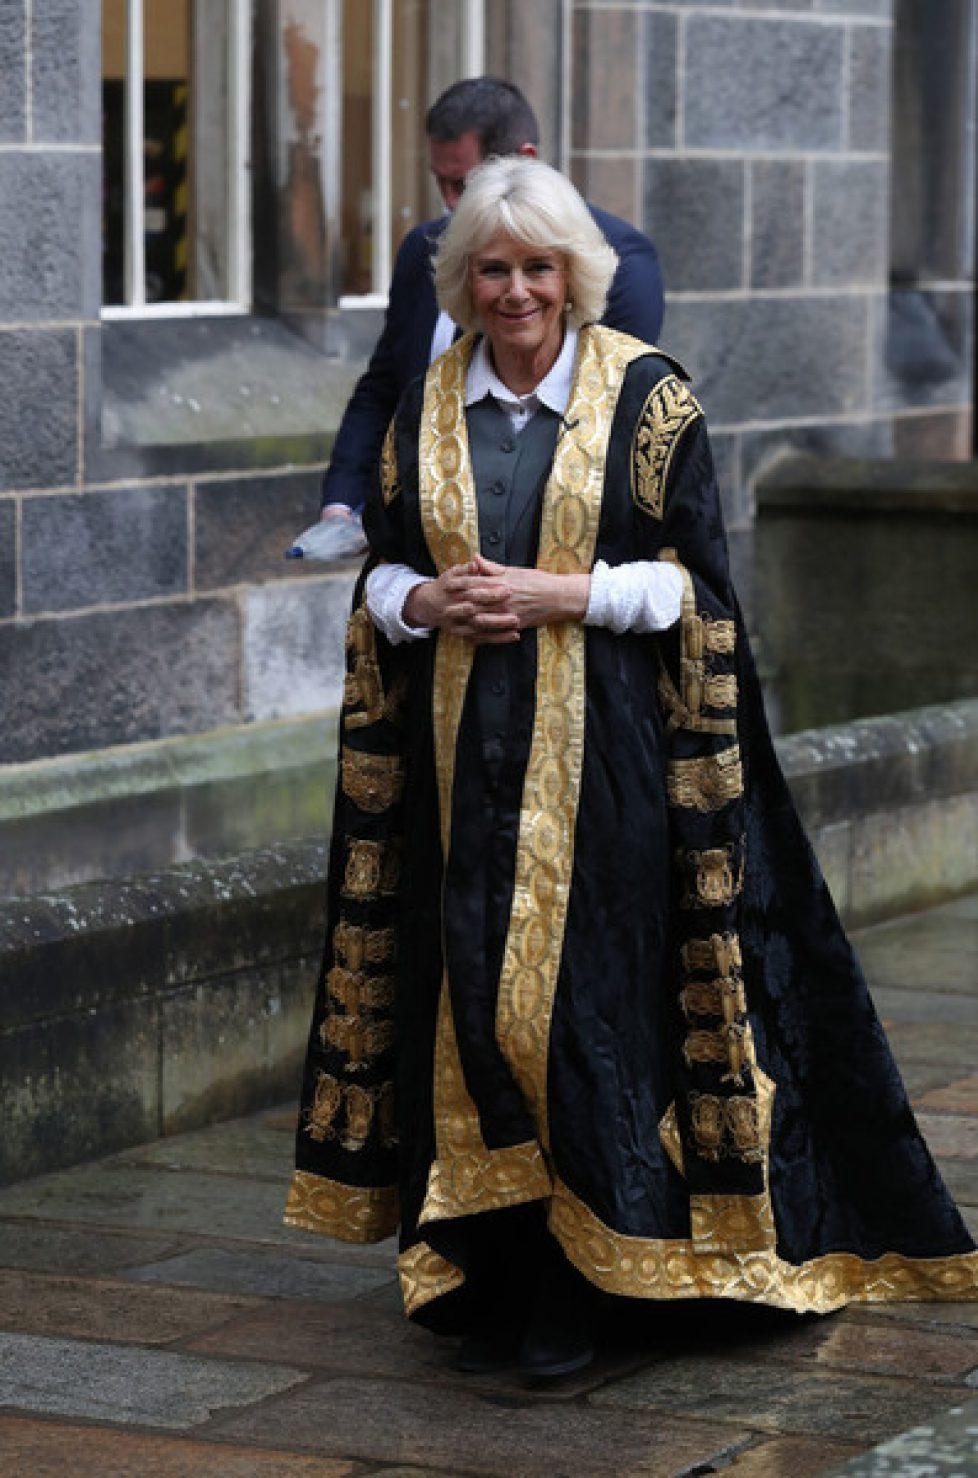 Duchess+Rothesay+Visits+Aberdeen+R_POJTGUdfil